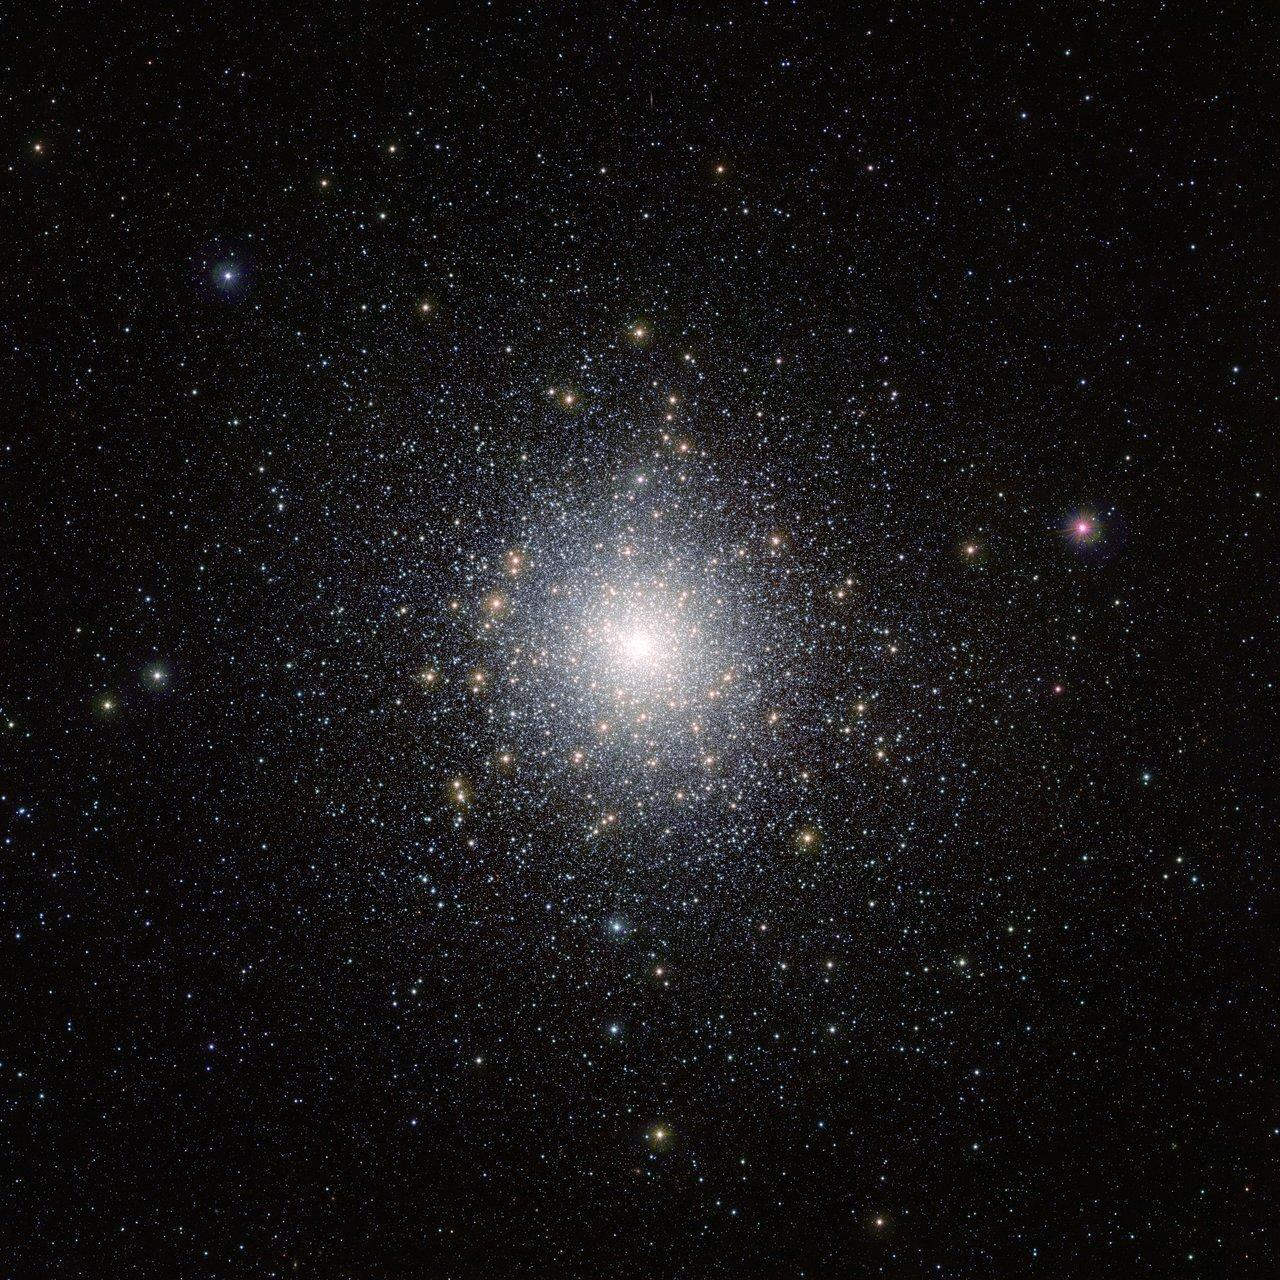 The globular star cluster 47 Tucanae